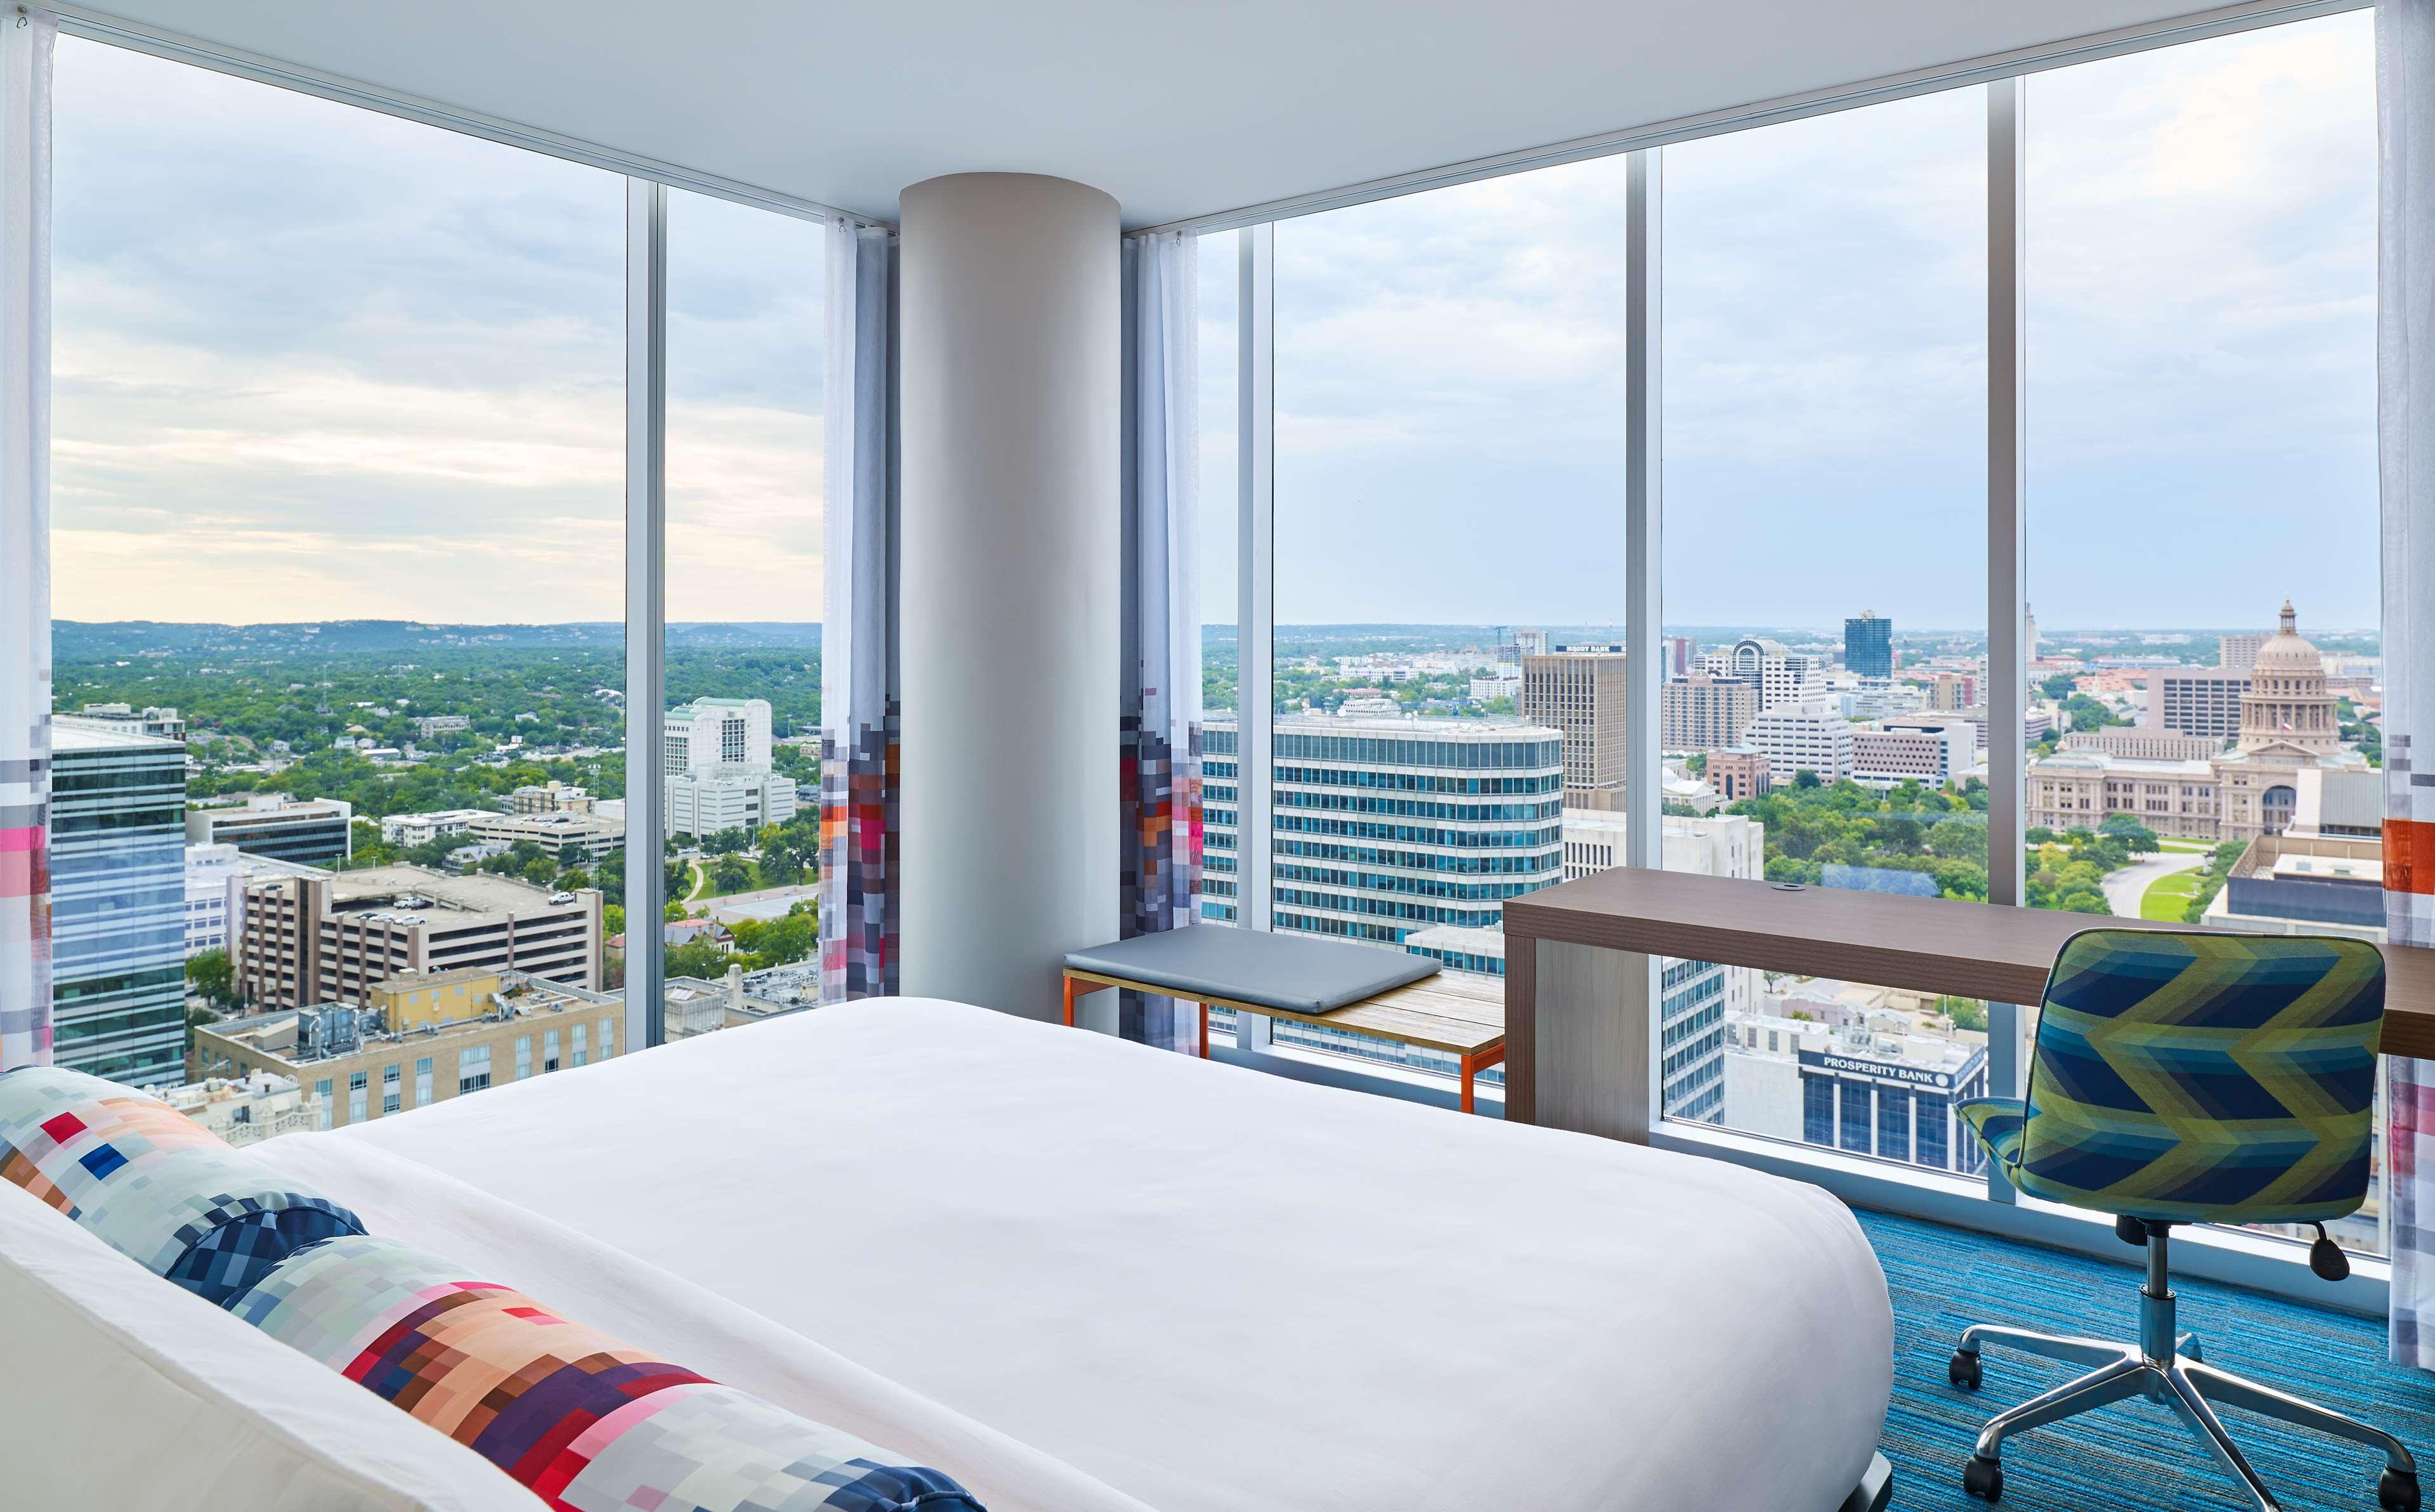 Aloft Hotel Austin Tx